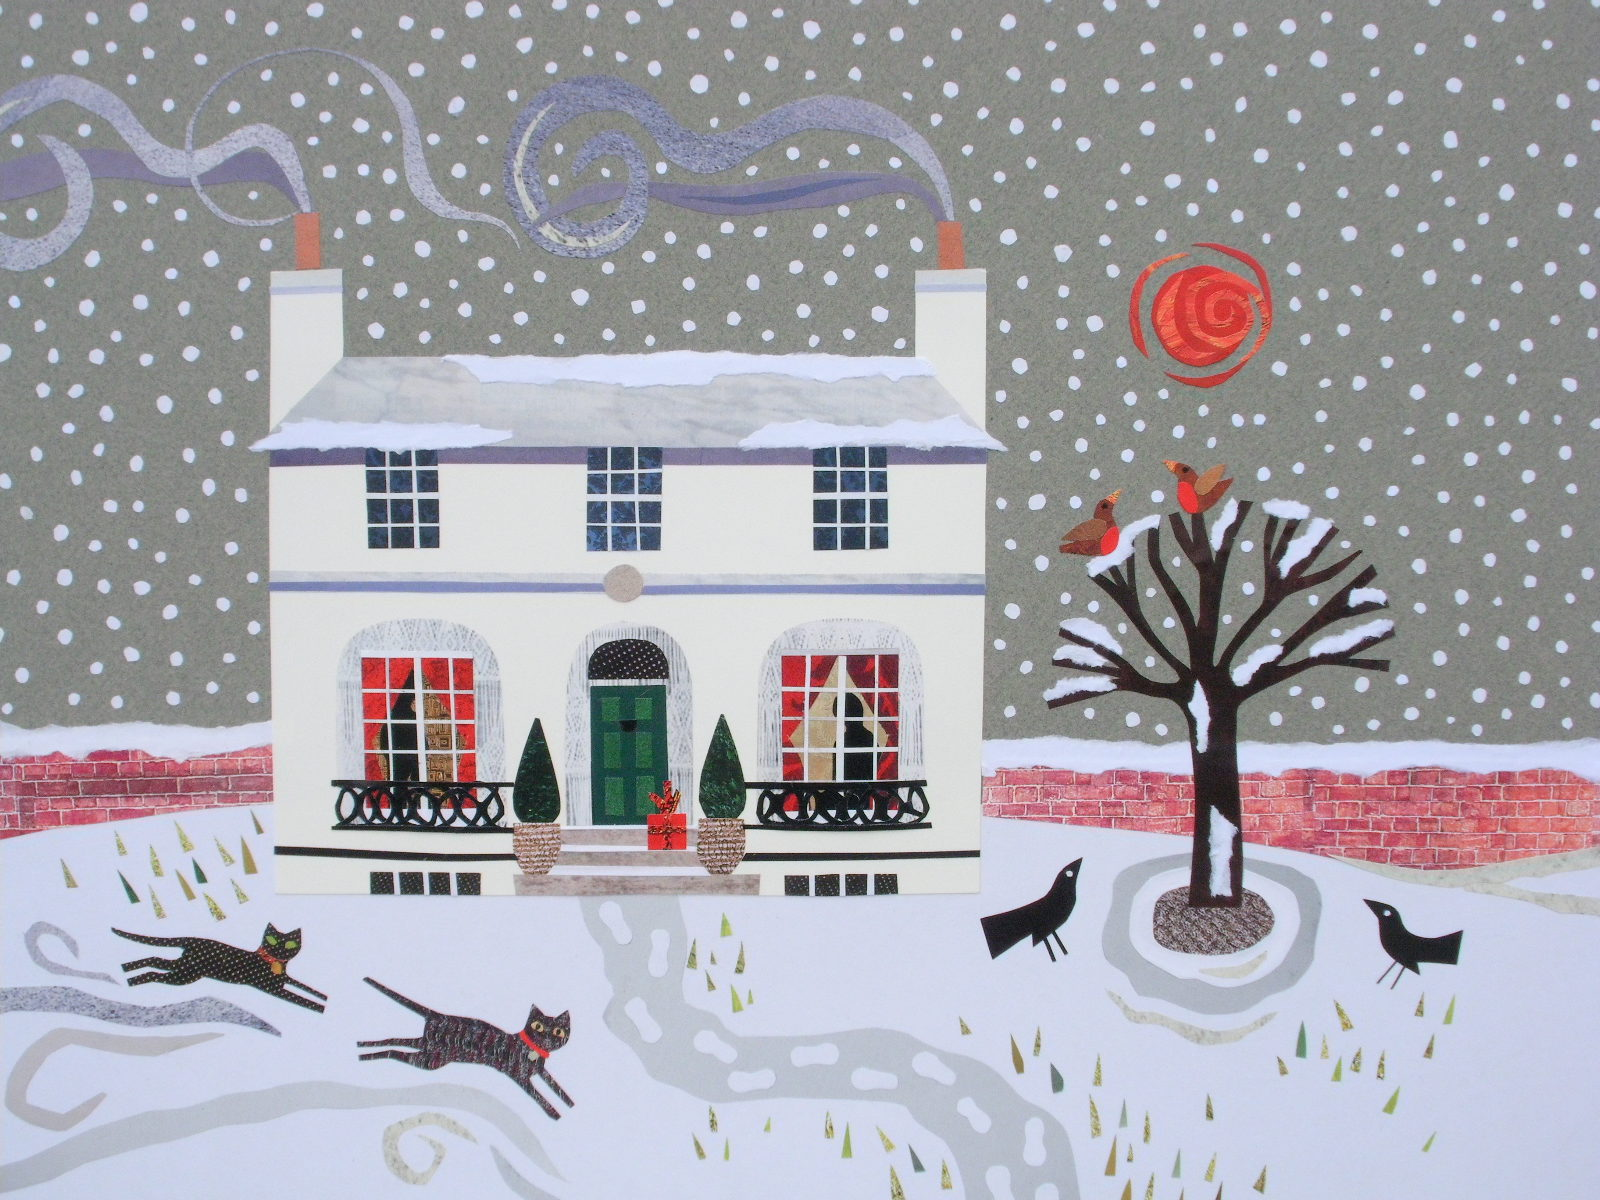 Amanda White - Contemporary Naive Art: Christmas cards